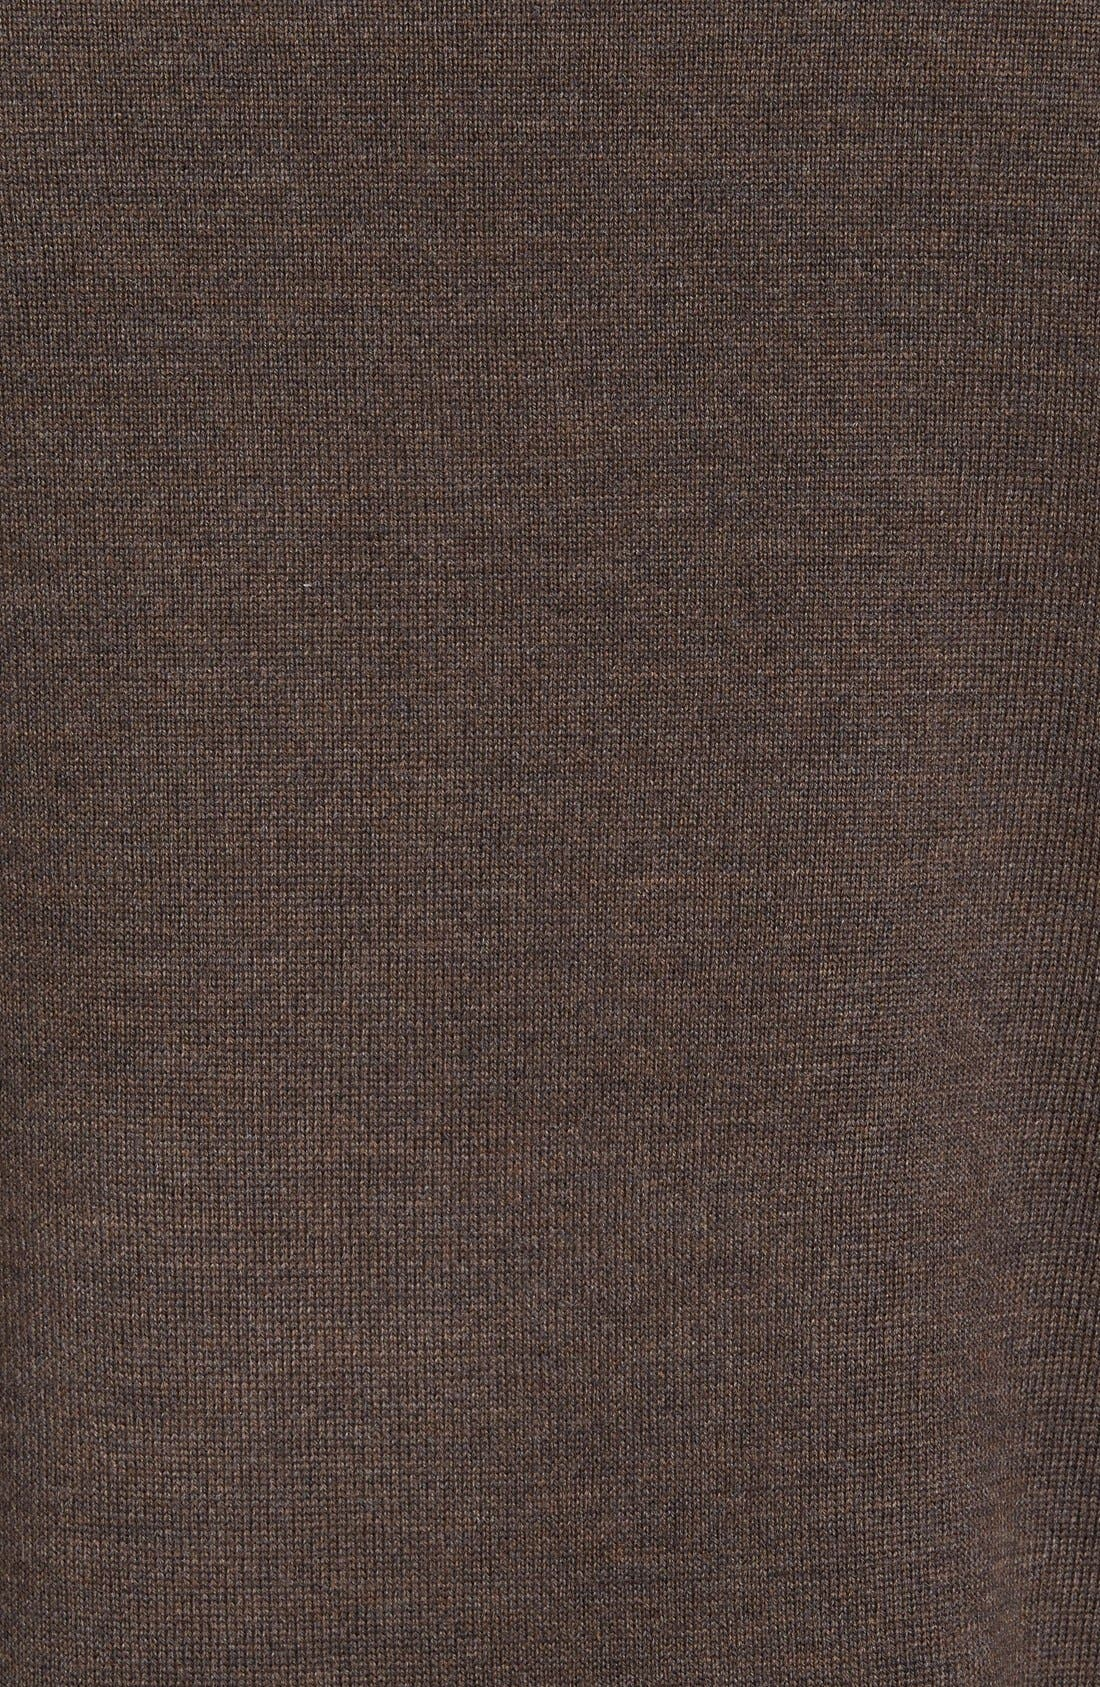 Alternate Image 5  - Nordstrom Mock Neck Merino Wool Sweater (Regular & Tall)